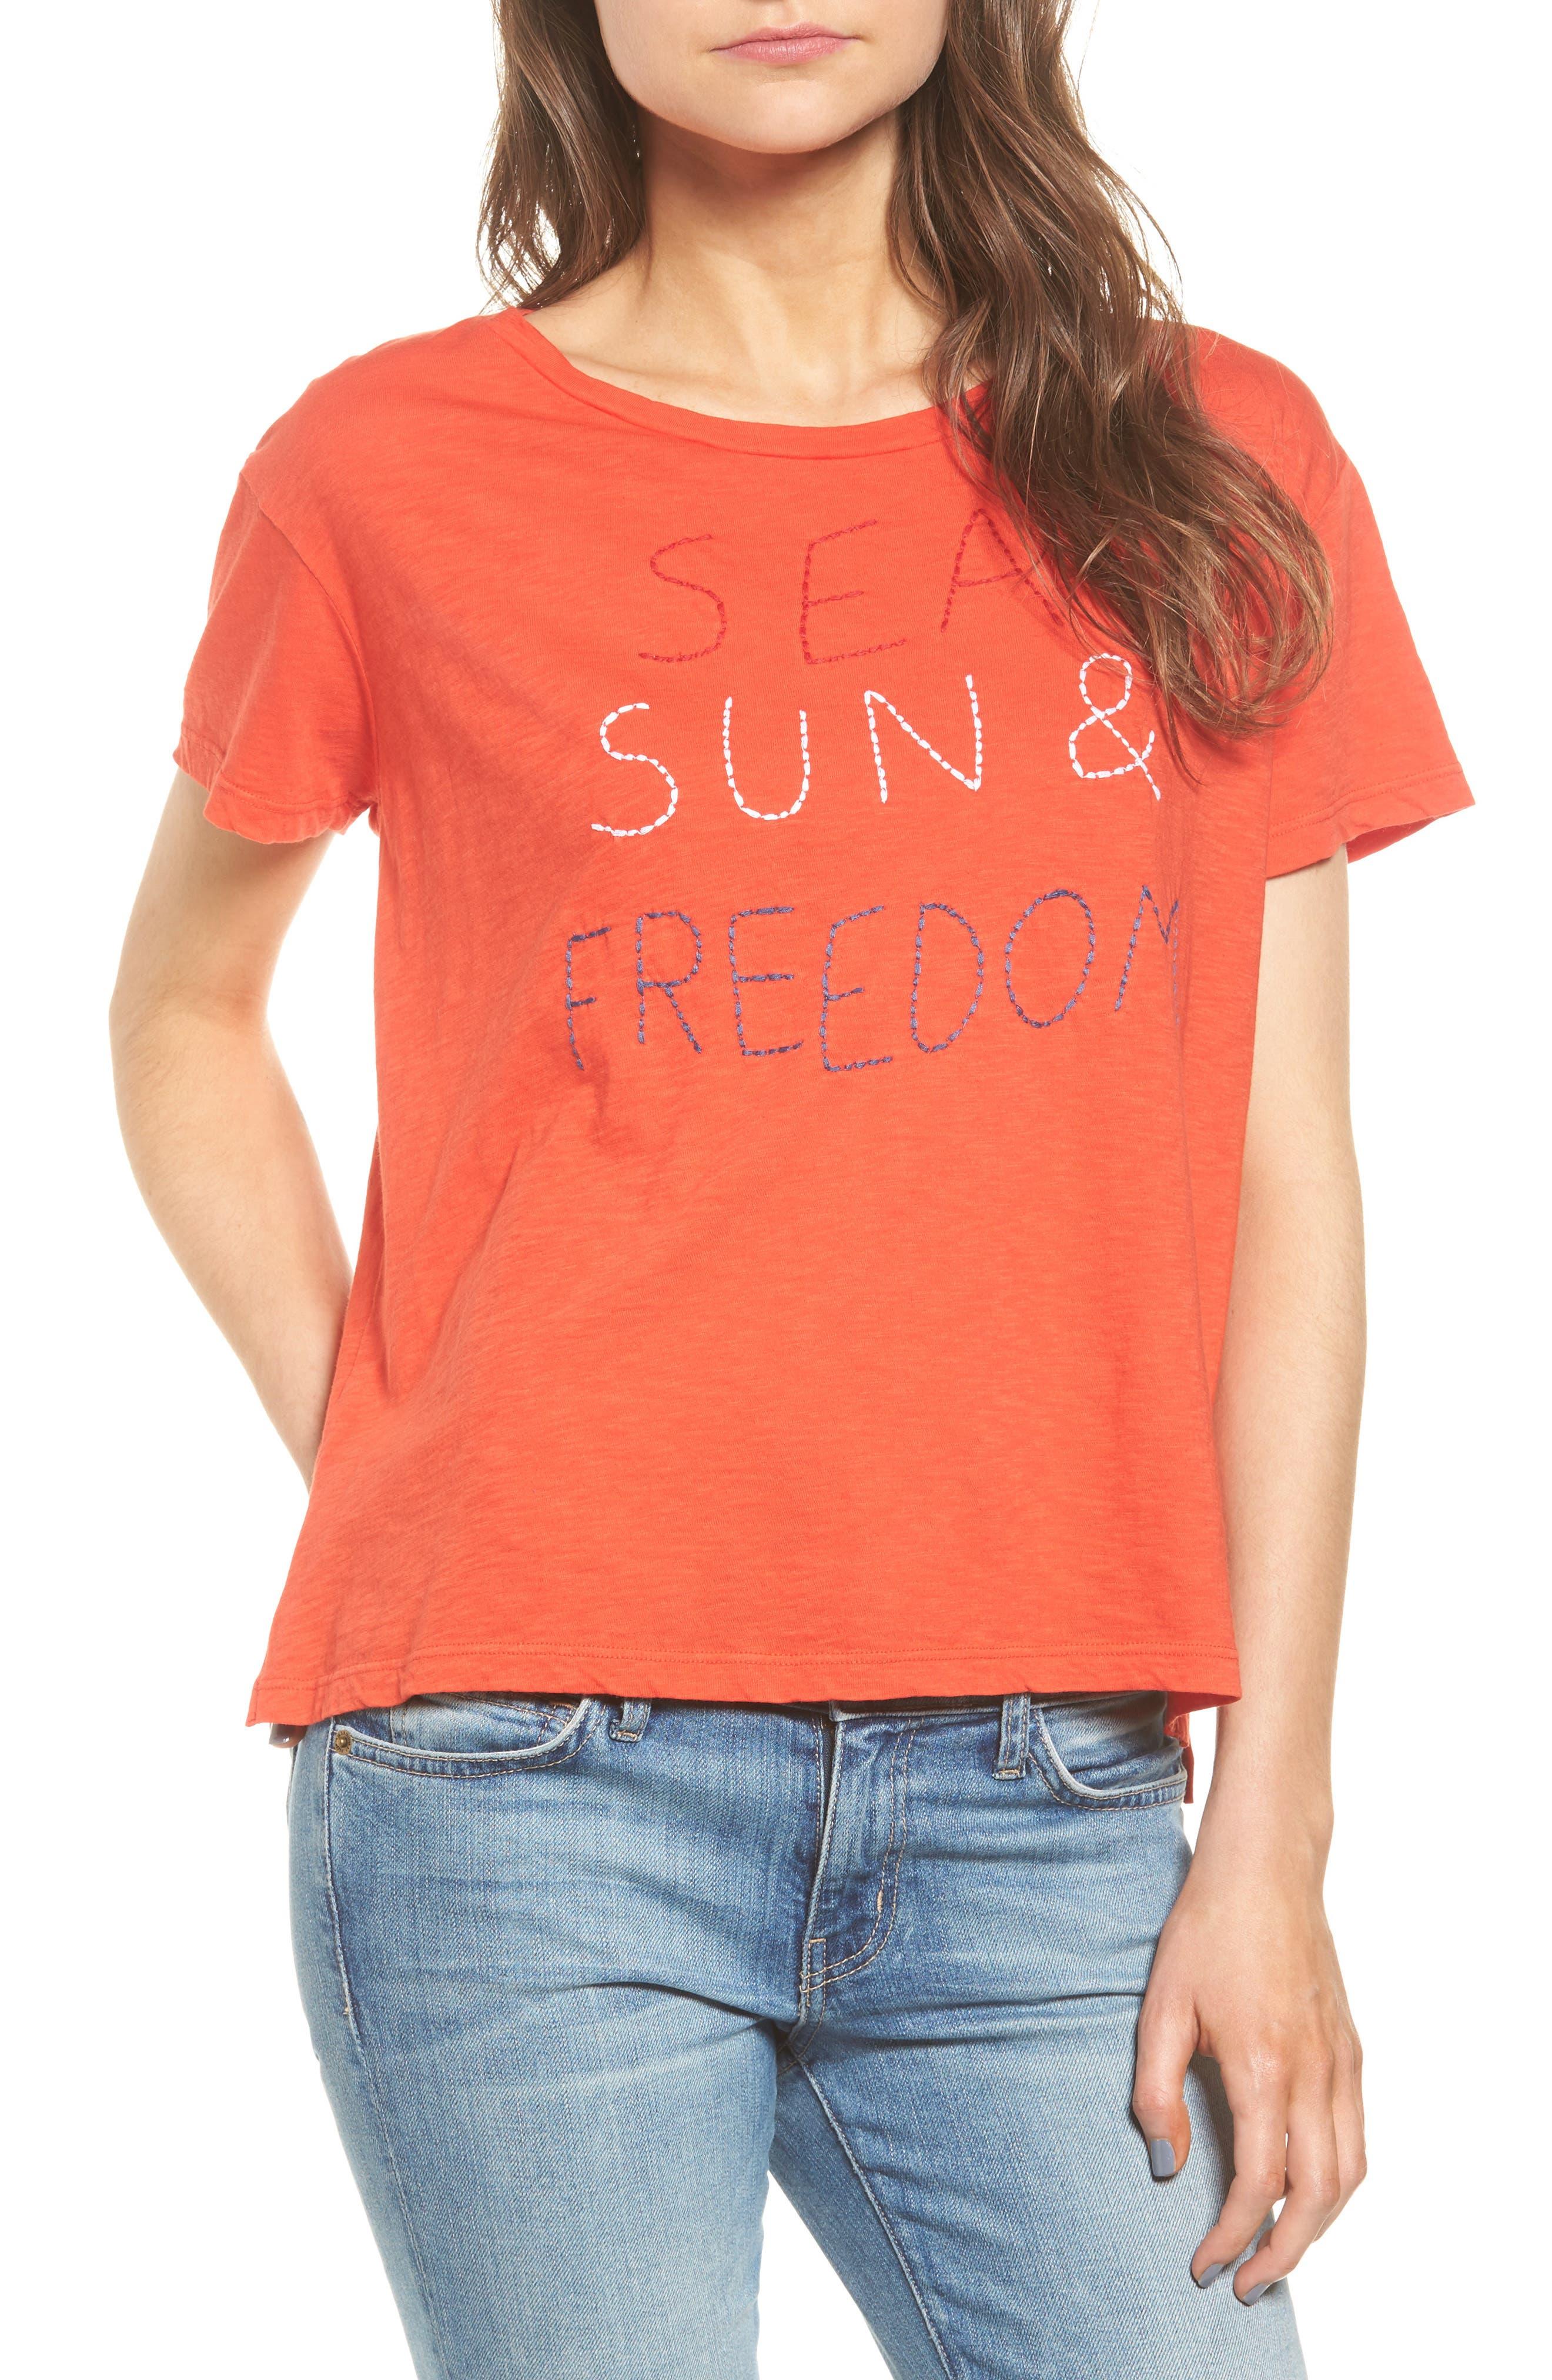 Sundry Sea Sun Freedom Tee (Nordstrom Exclusive)